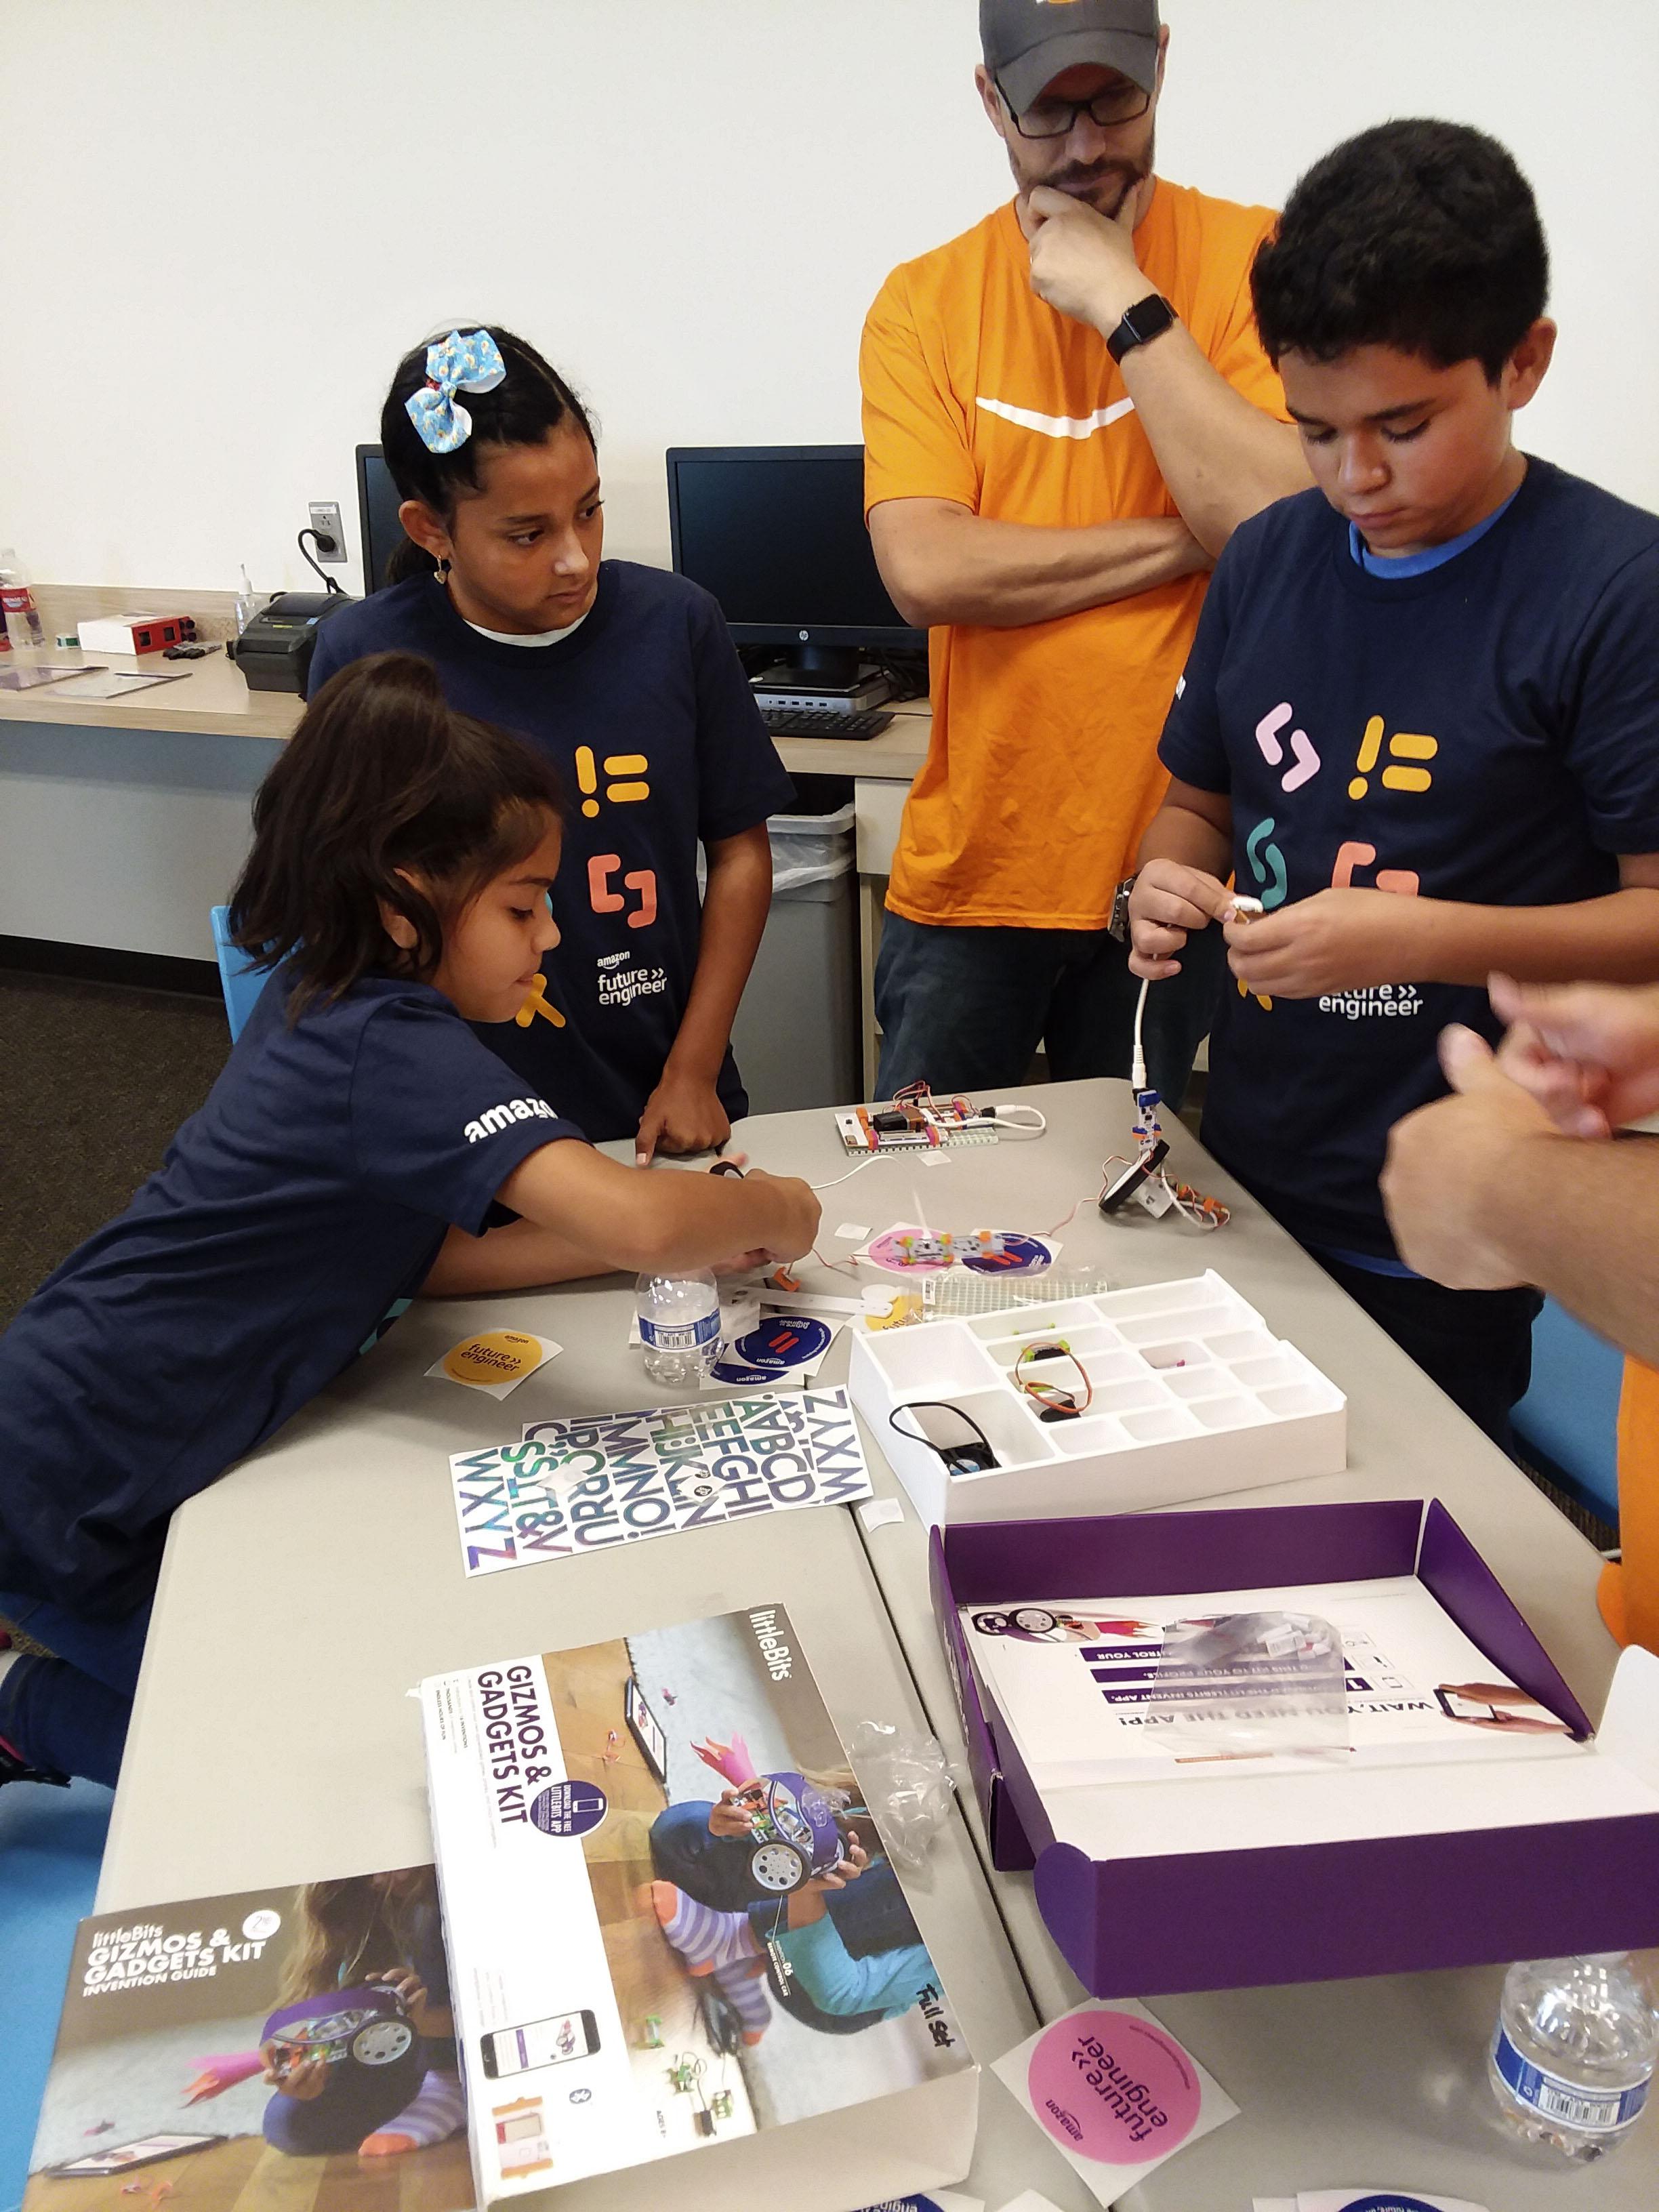 Woodrow Wilson Elementary School students embark on a robot-building mission at Amazon's Salt Lake City fulfillment center on Thursday, Sept. 12, 2019.